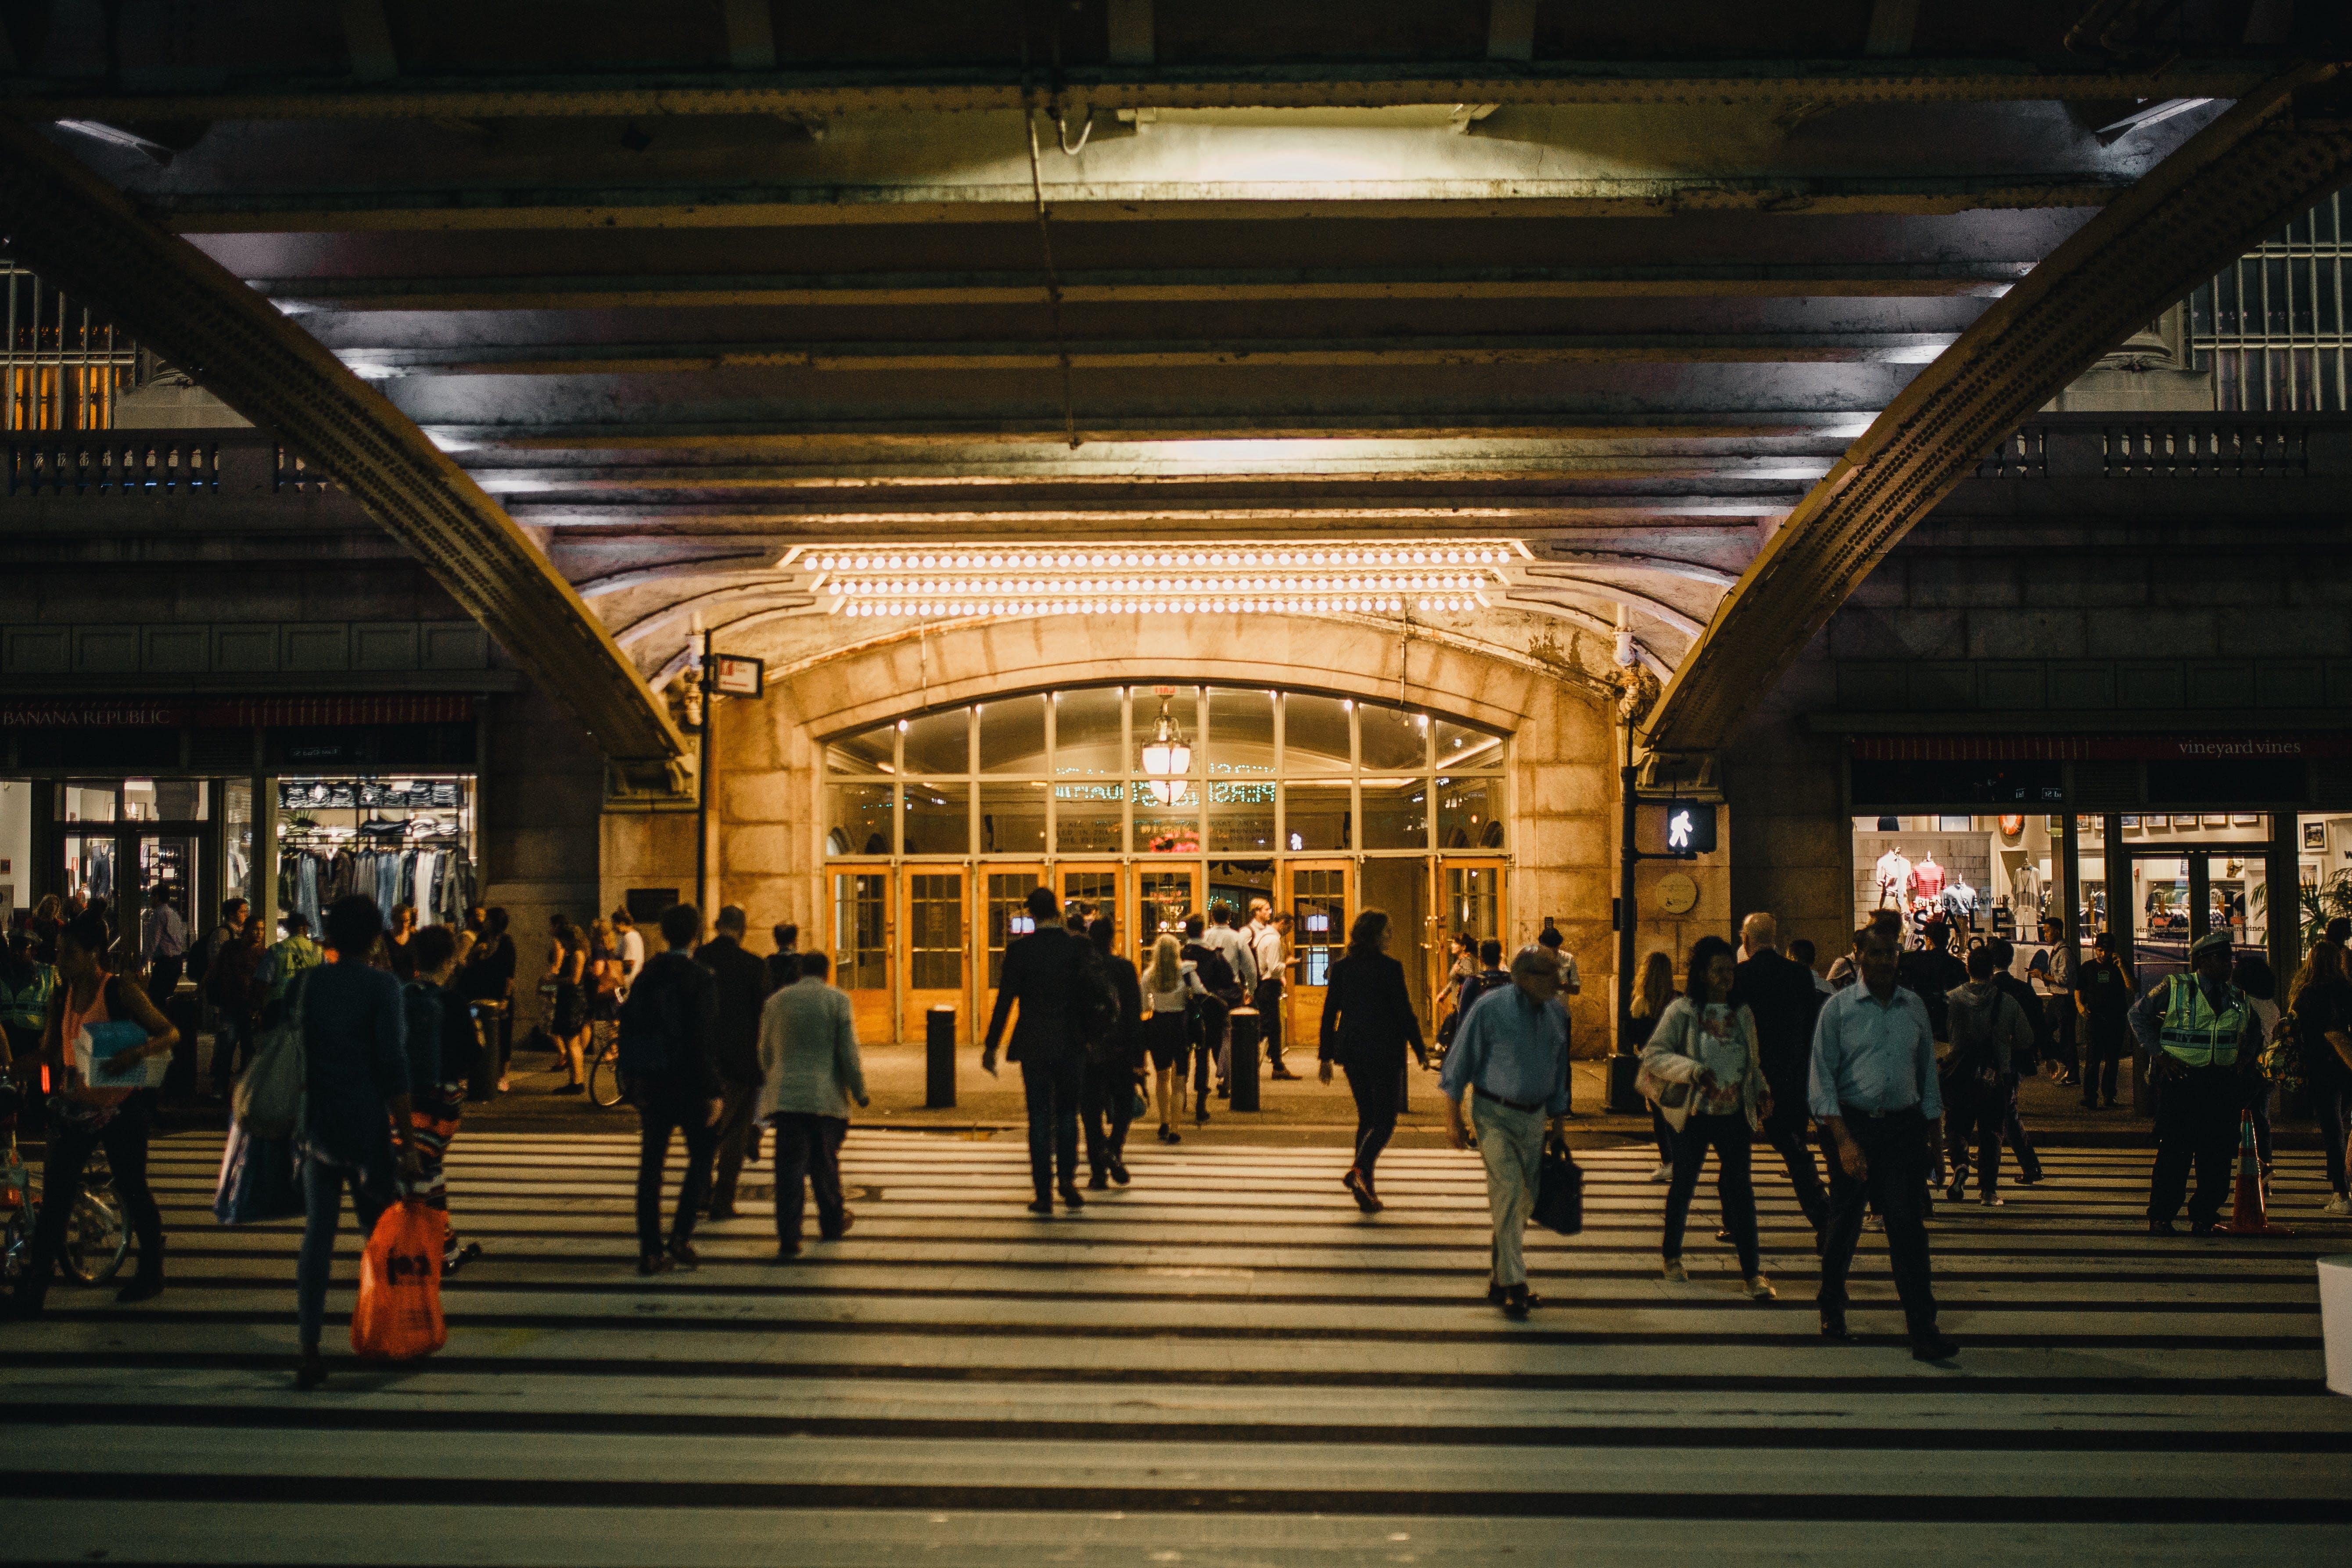 People Walking Near Building at Night